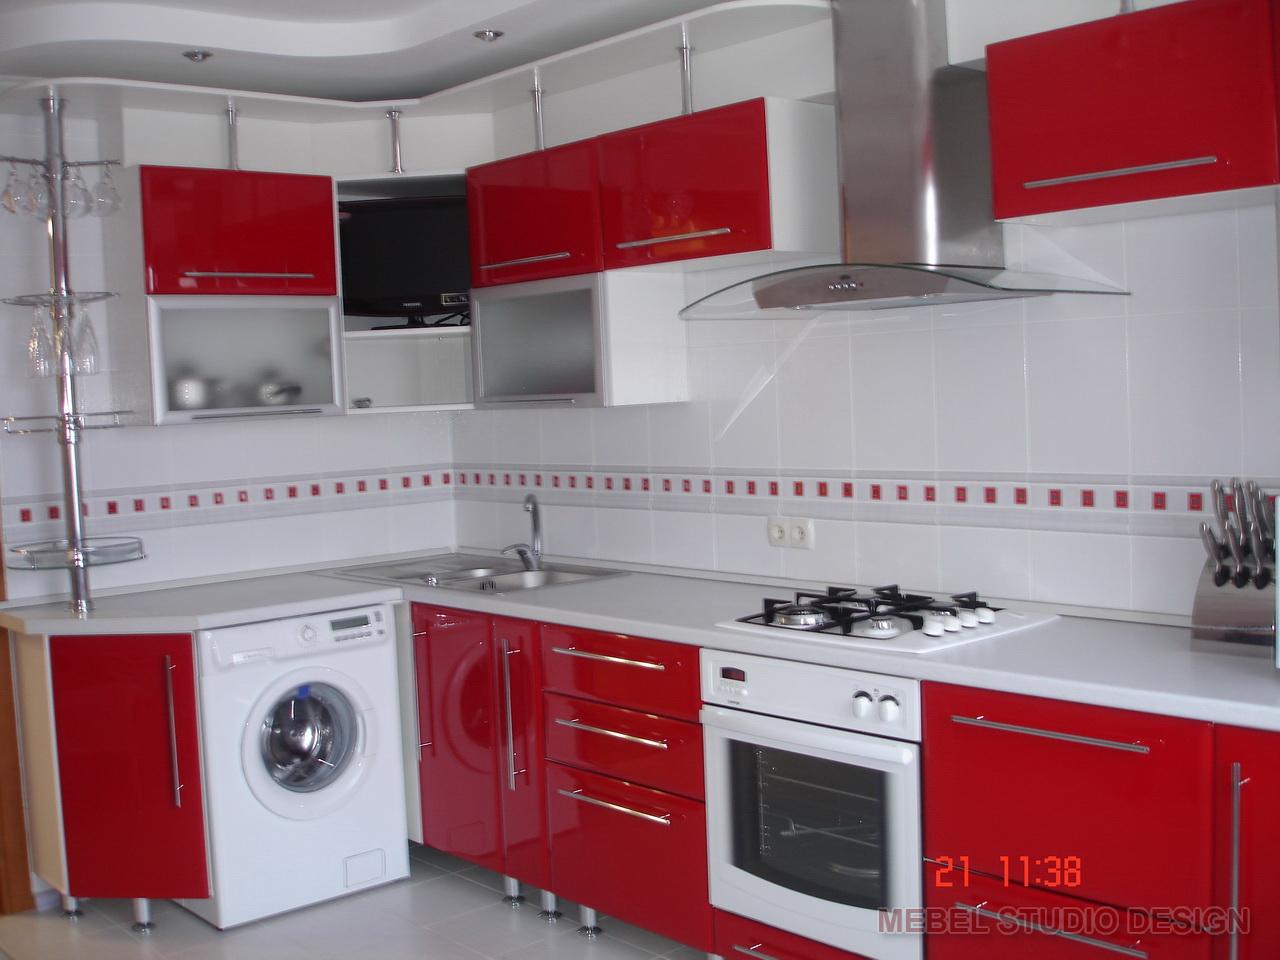 кухня на заказ цена мебель для кухни дизайн производство полтава